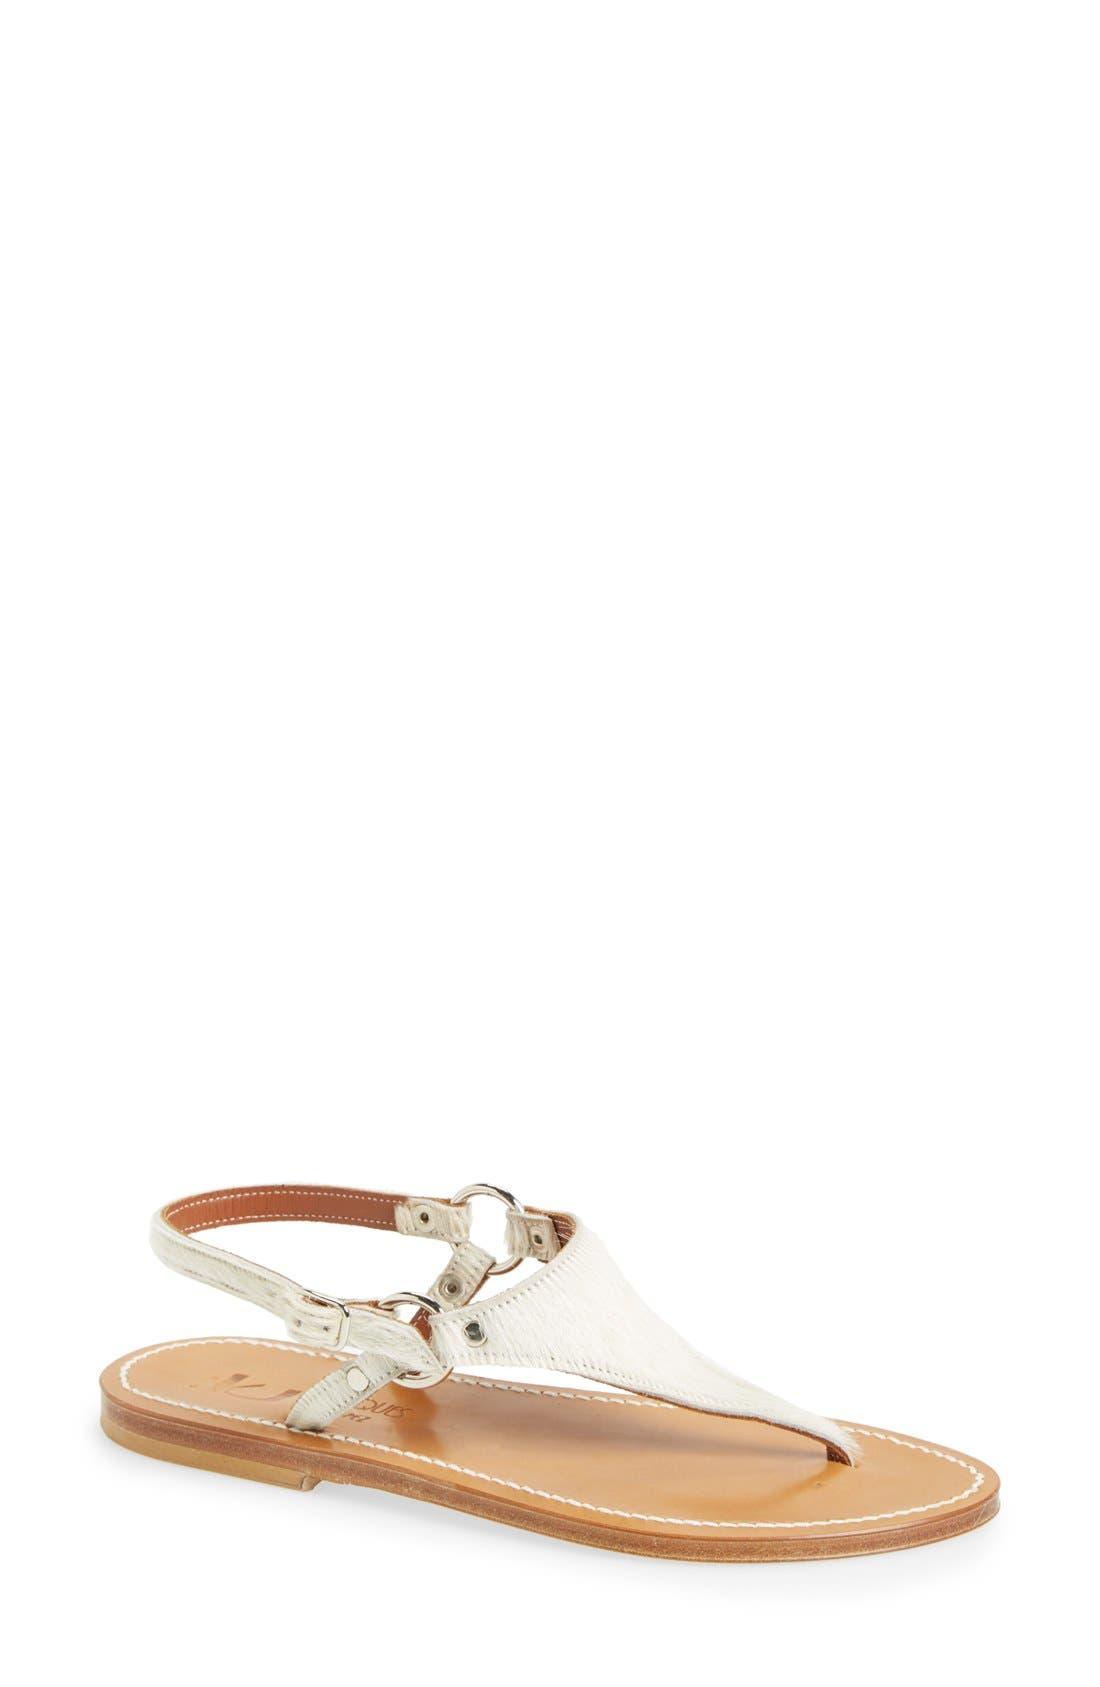 Main Image - K.Jacques St. Tropez Slingback Thong Sandal (Women)